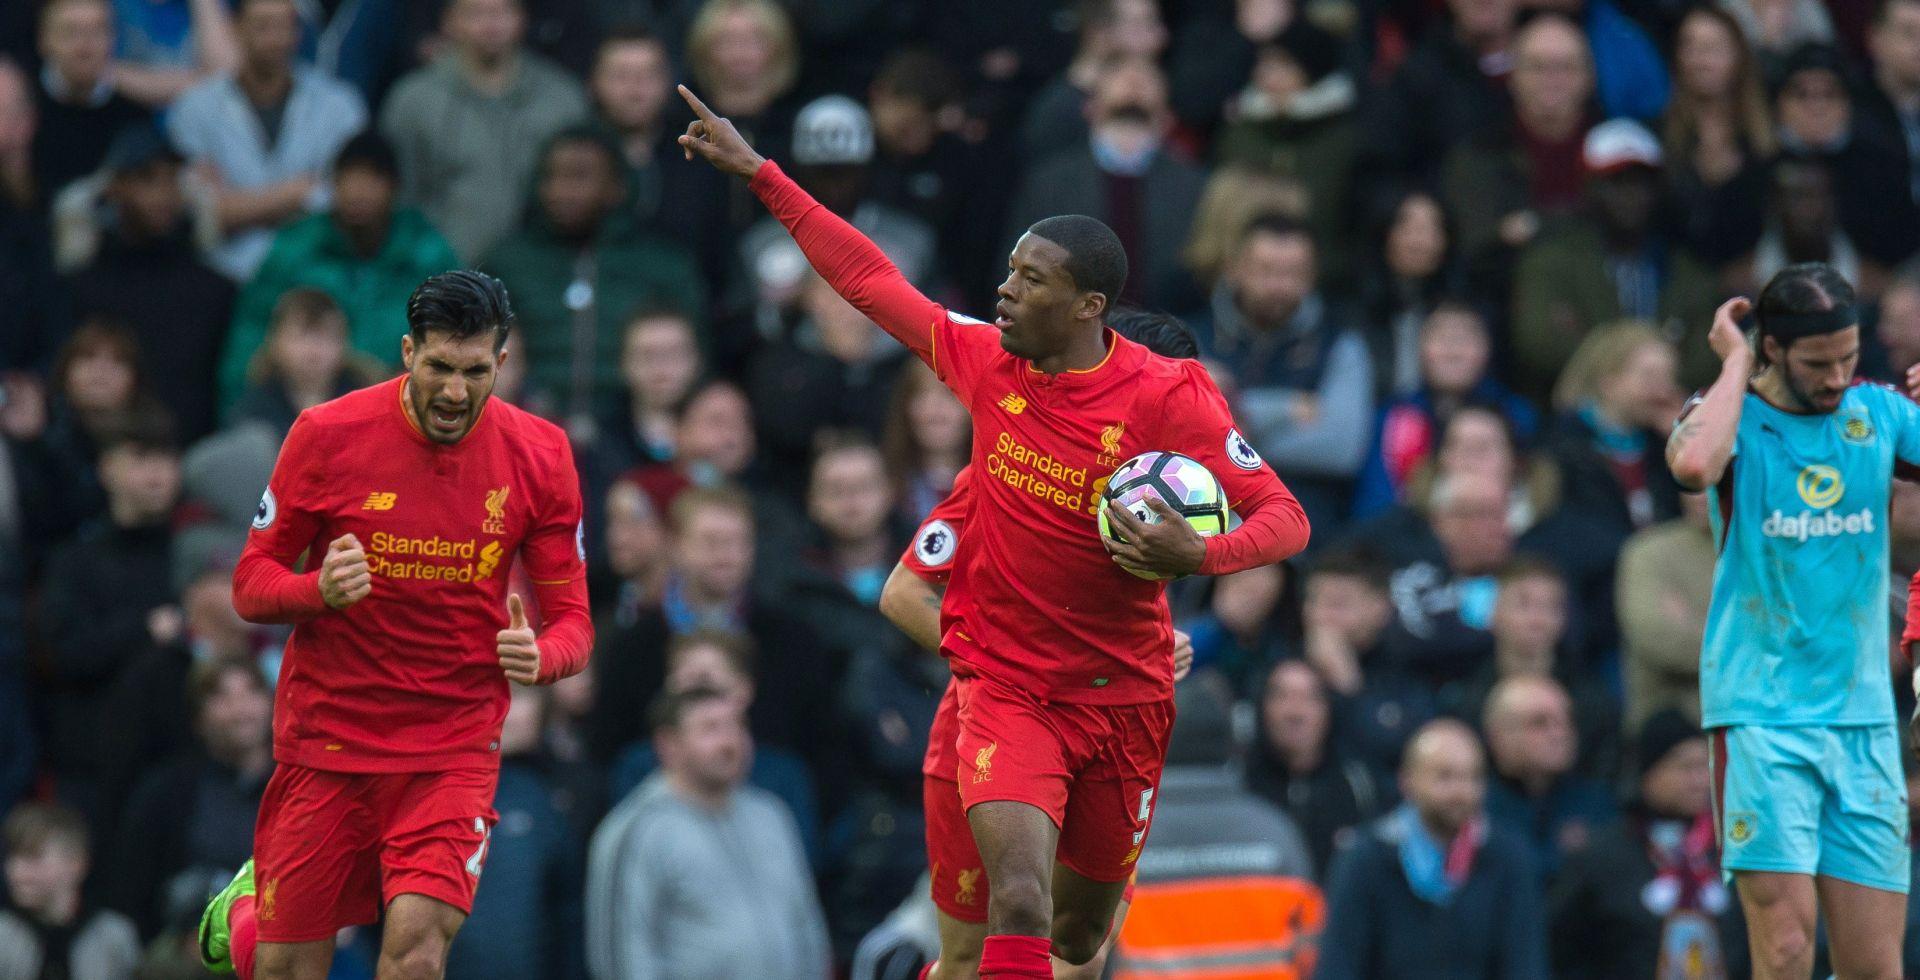 GOLIJADA U PREMIER LIGI Liverpool – Swansea 5-0